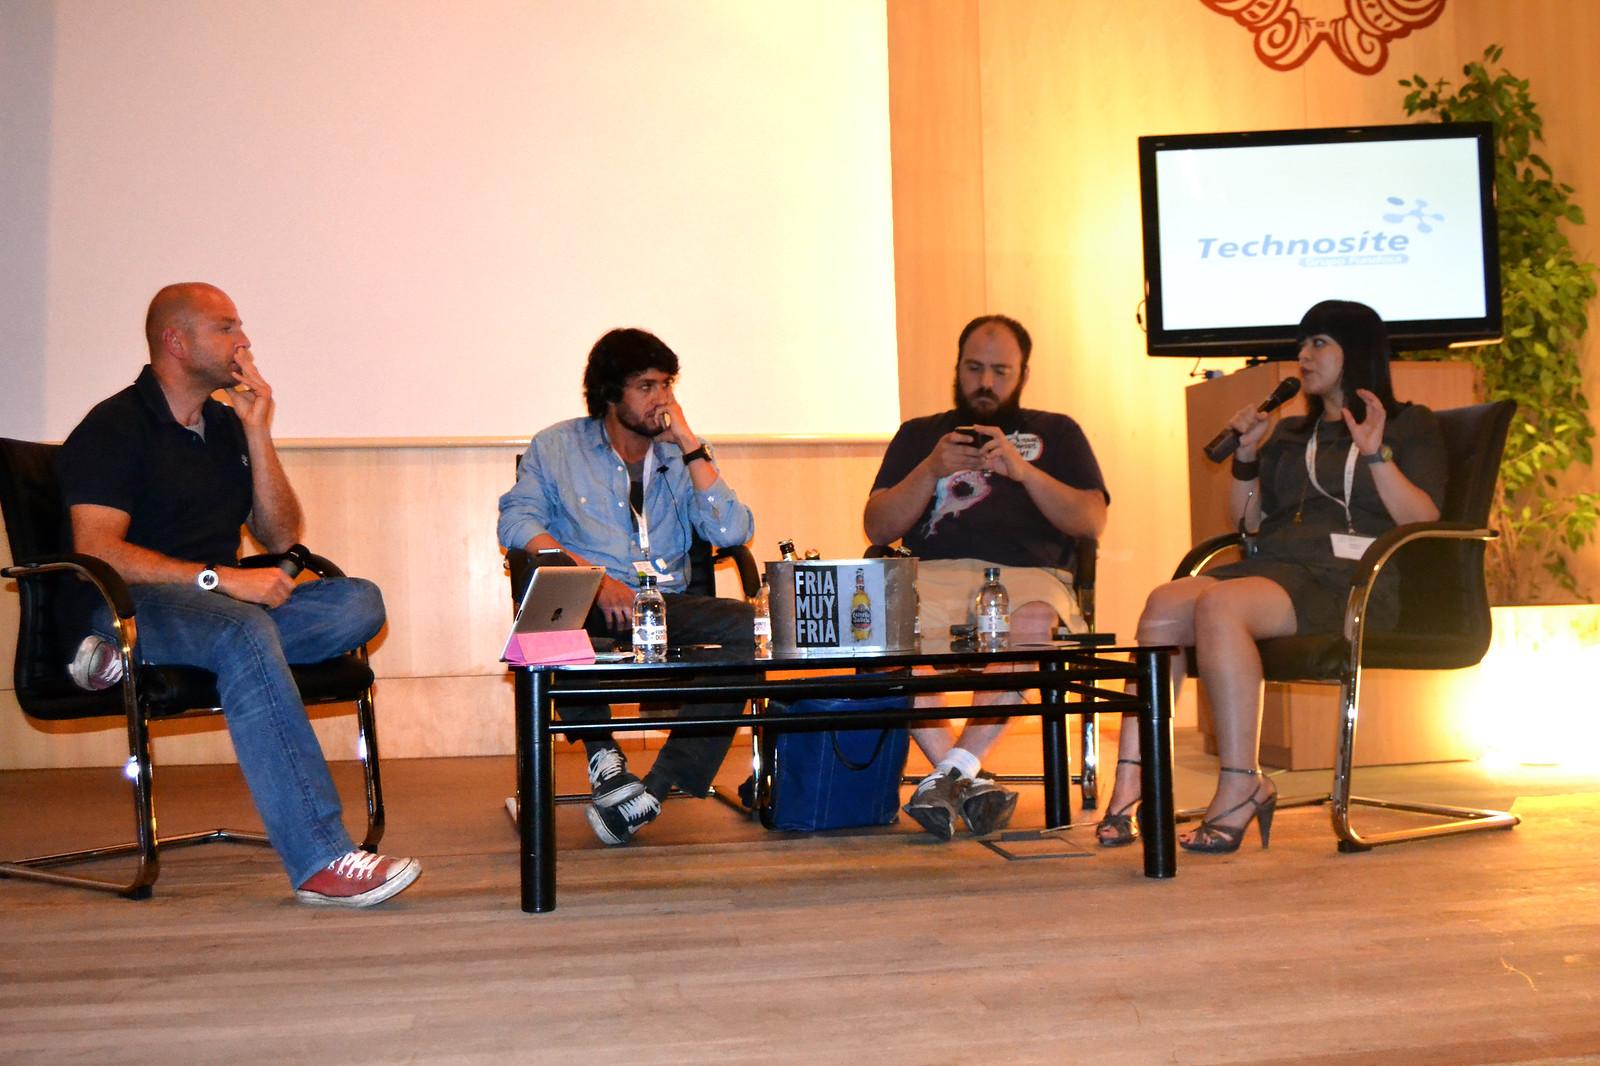 Juan Leal, Jesús Gorriti, Sergio Álvarez y Margarita Barrera en el UxSpain